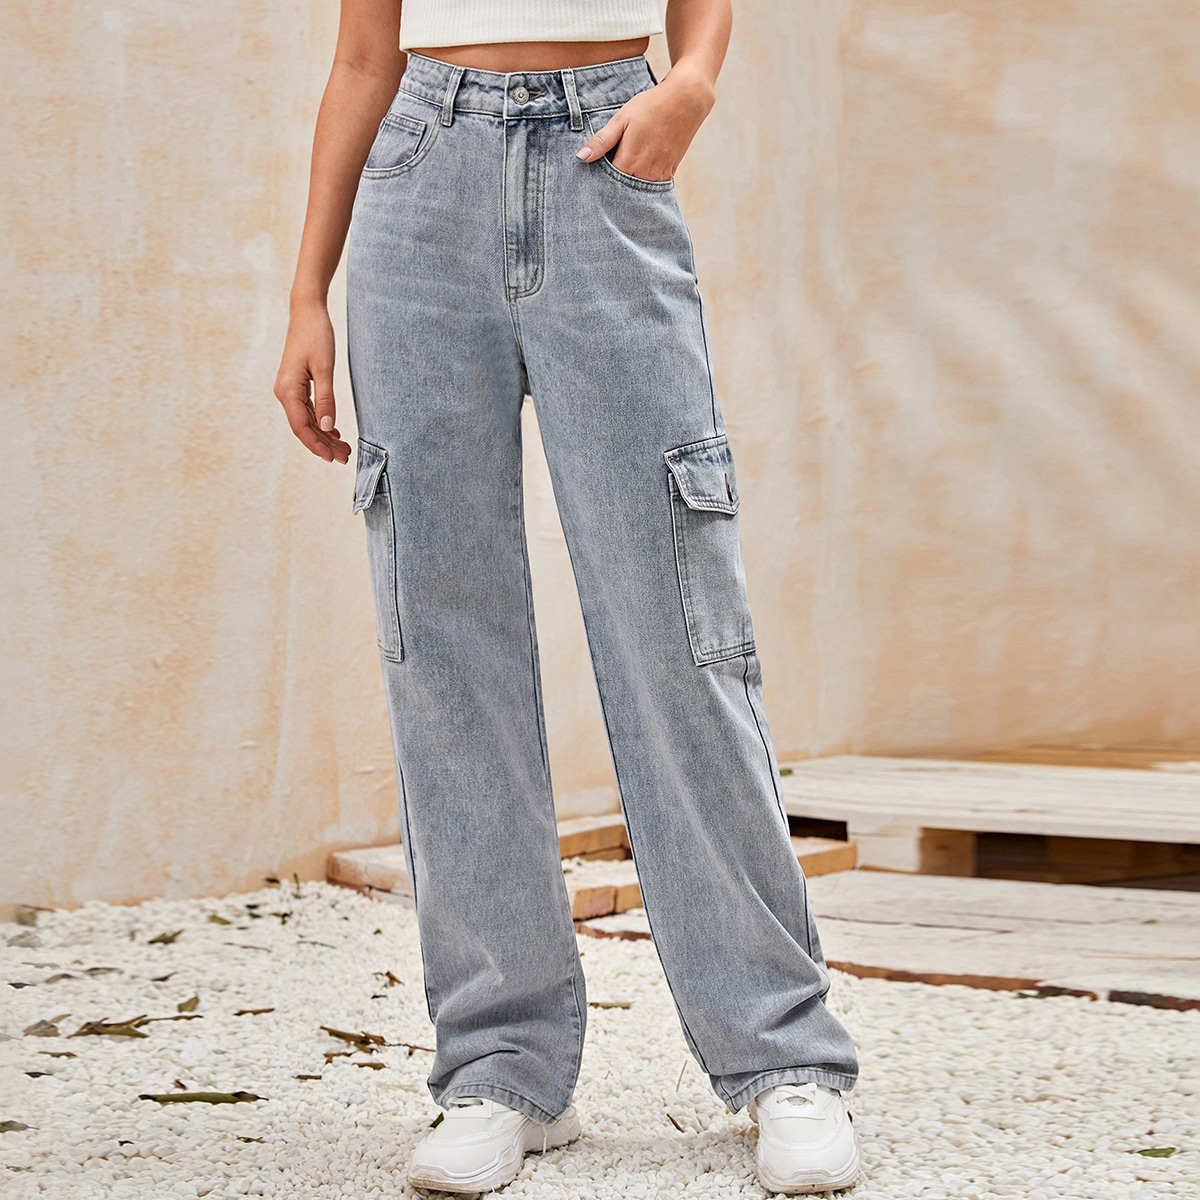 High Waisted Flap Pocket Side Baggy Jeans